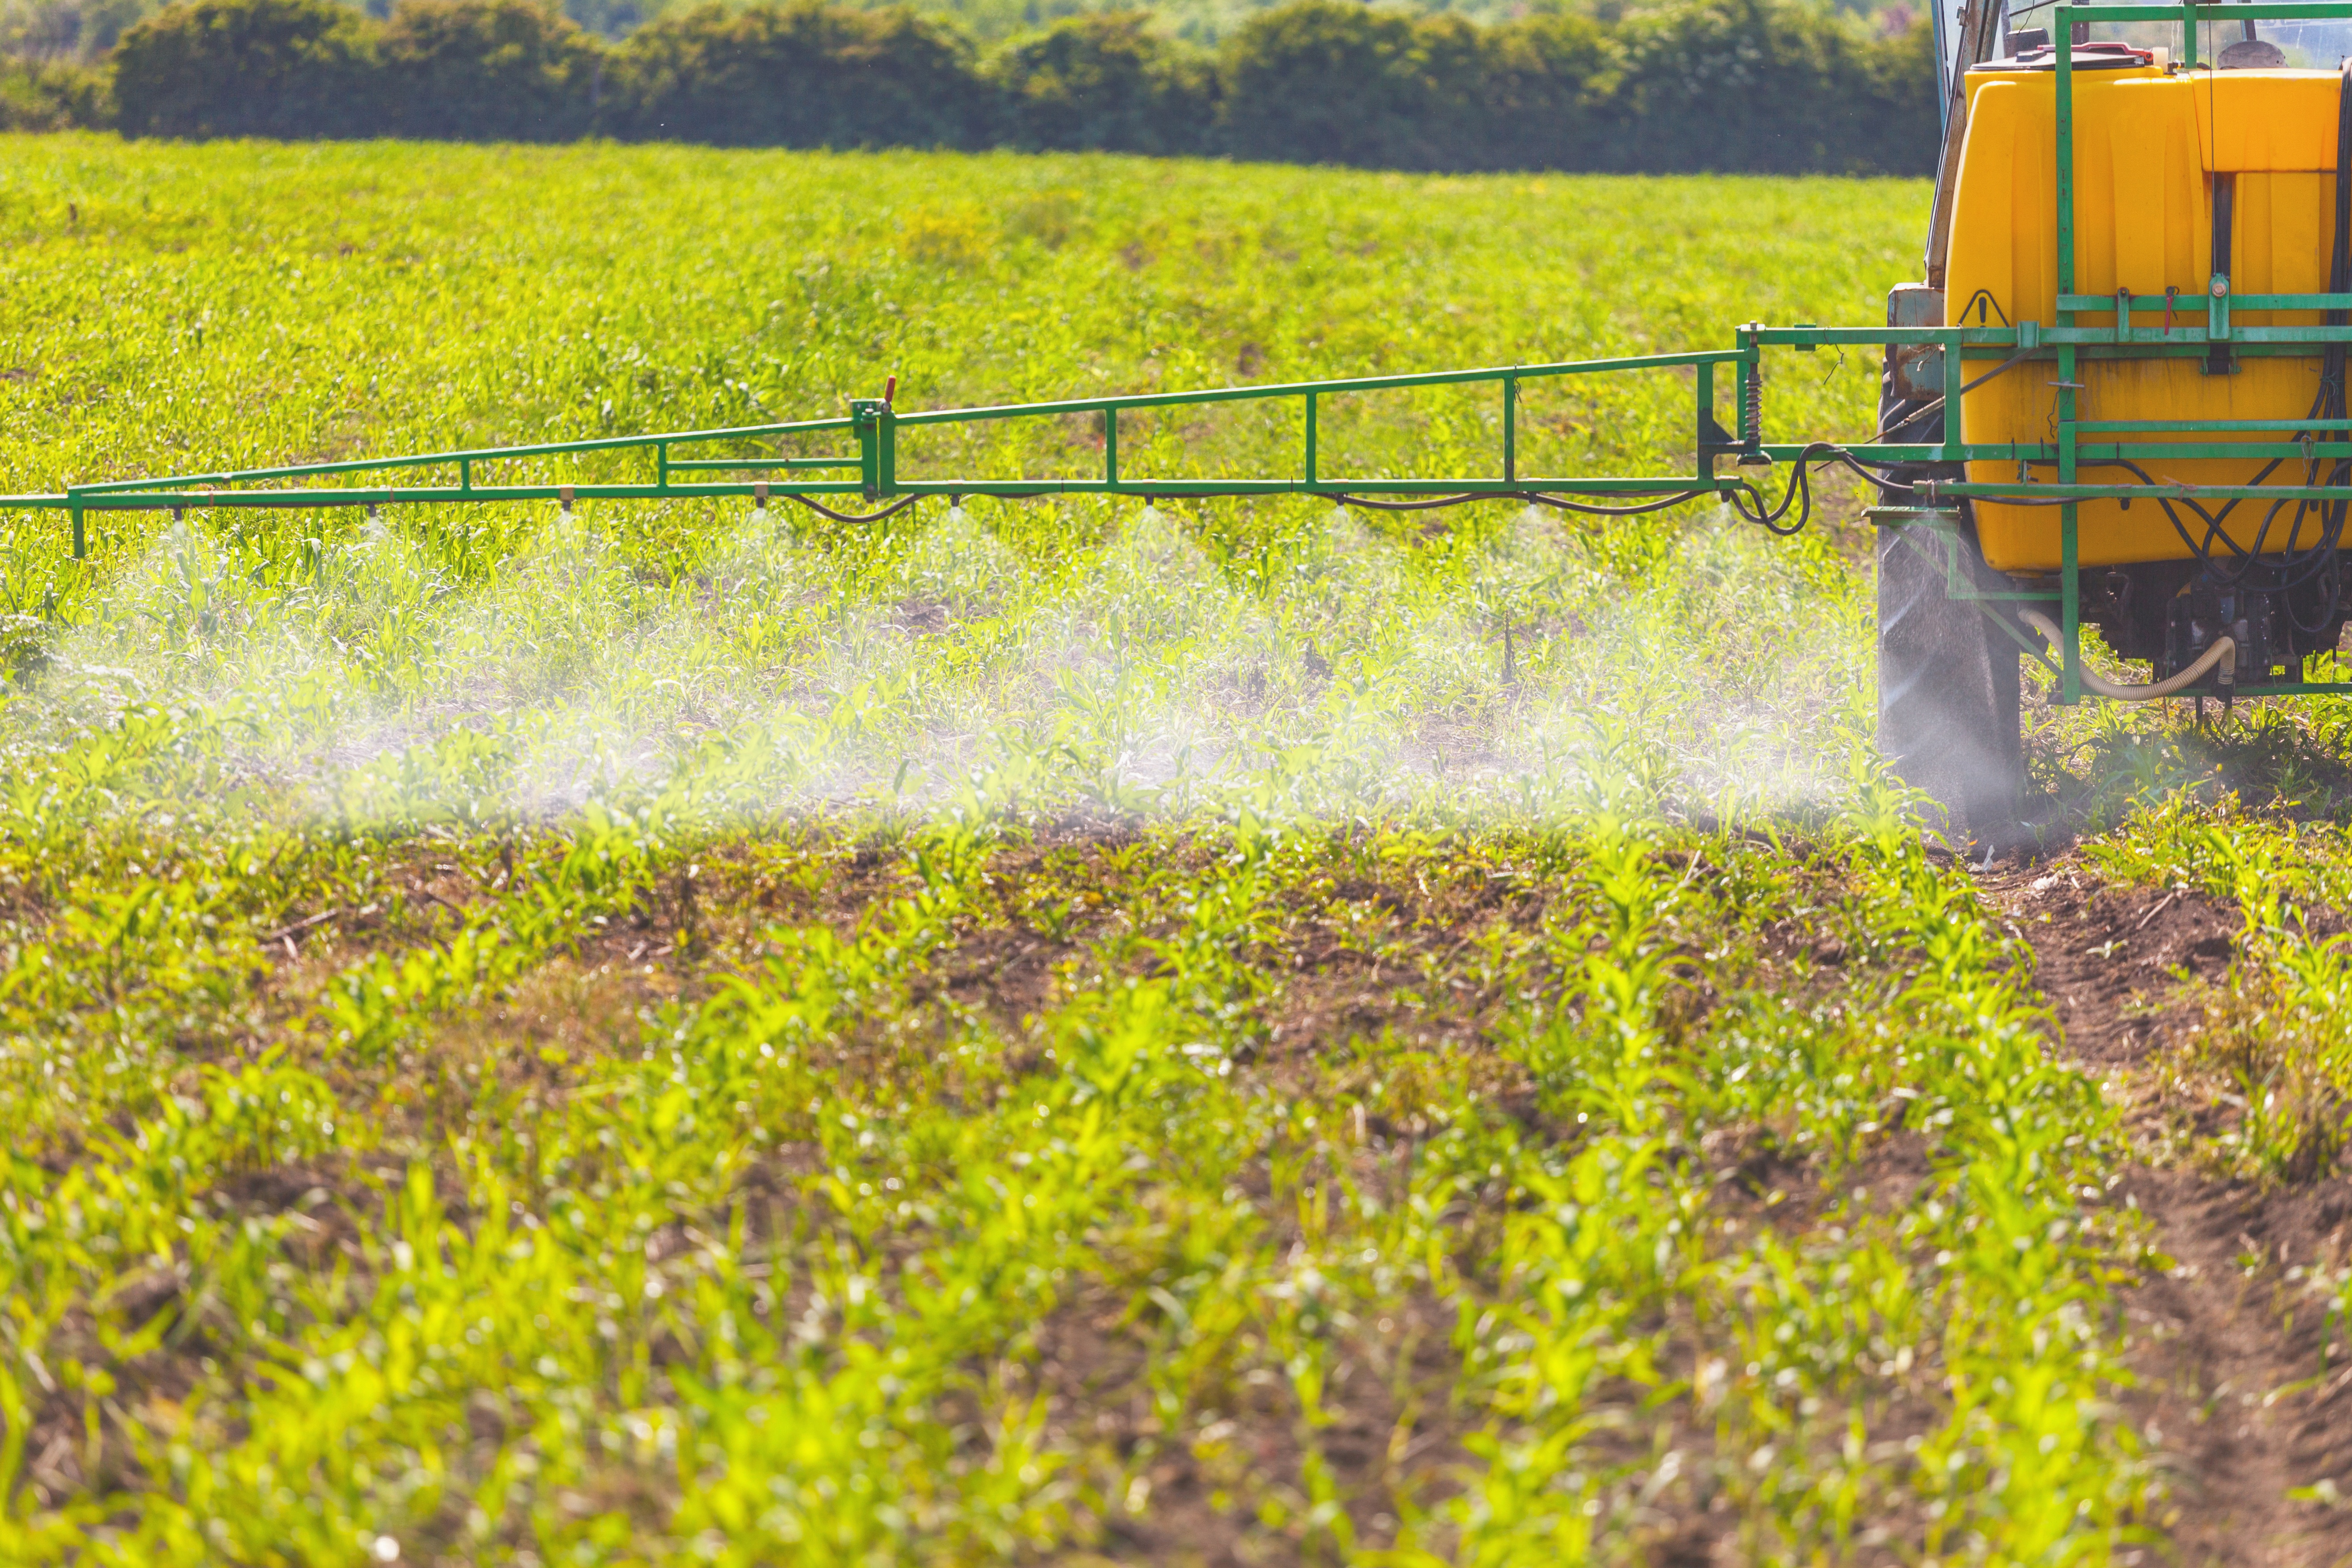 Agrochemical-stock-photo.jpeg